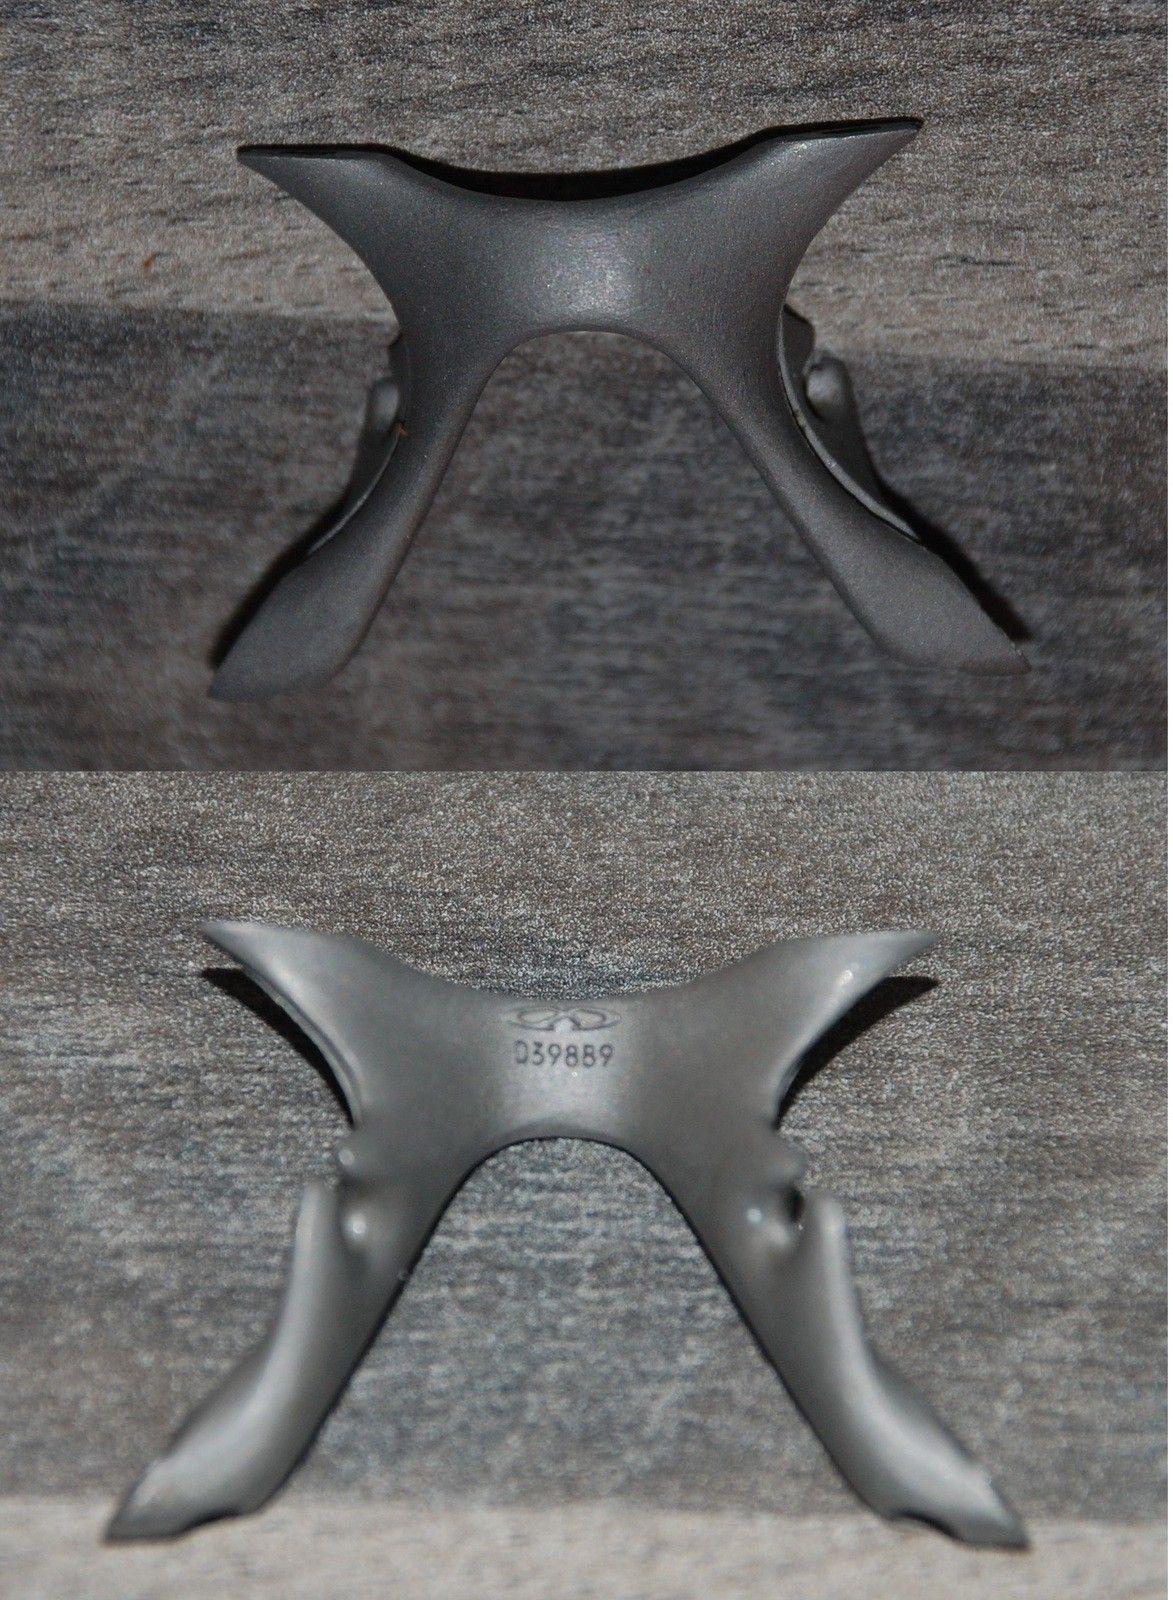 Penny-R1-Juliet-O-matter parts, stands, BOB keychain, Icon Claw Carabiner, Kevlar Wallet, display .. - R1 Nosebridge.jpg